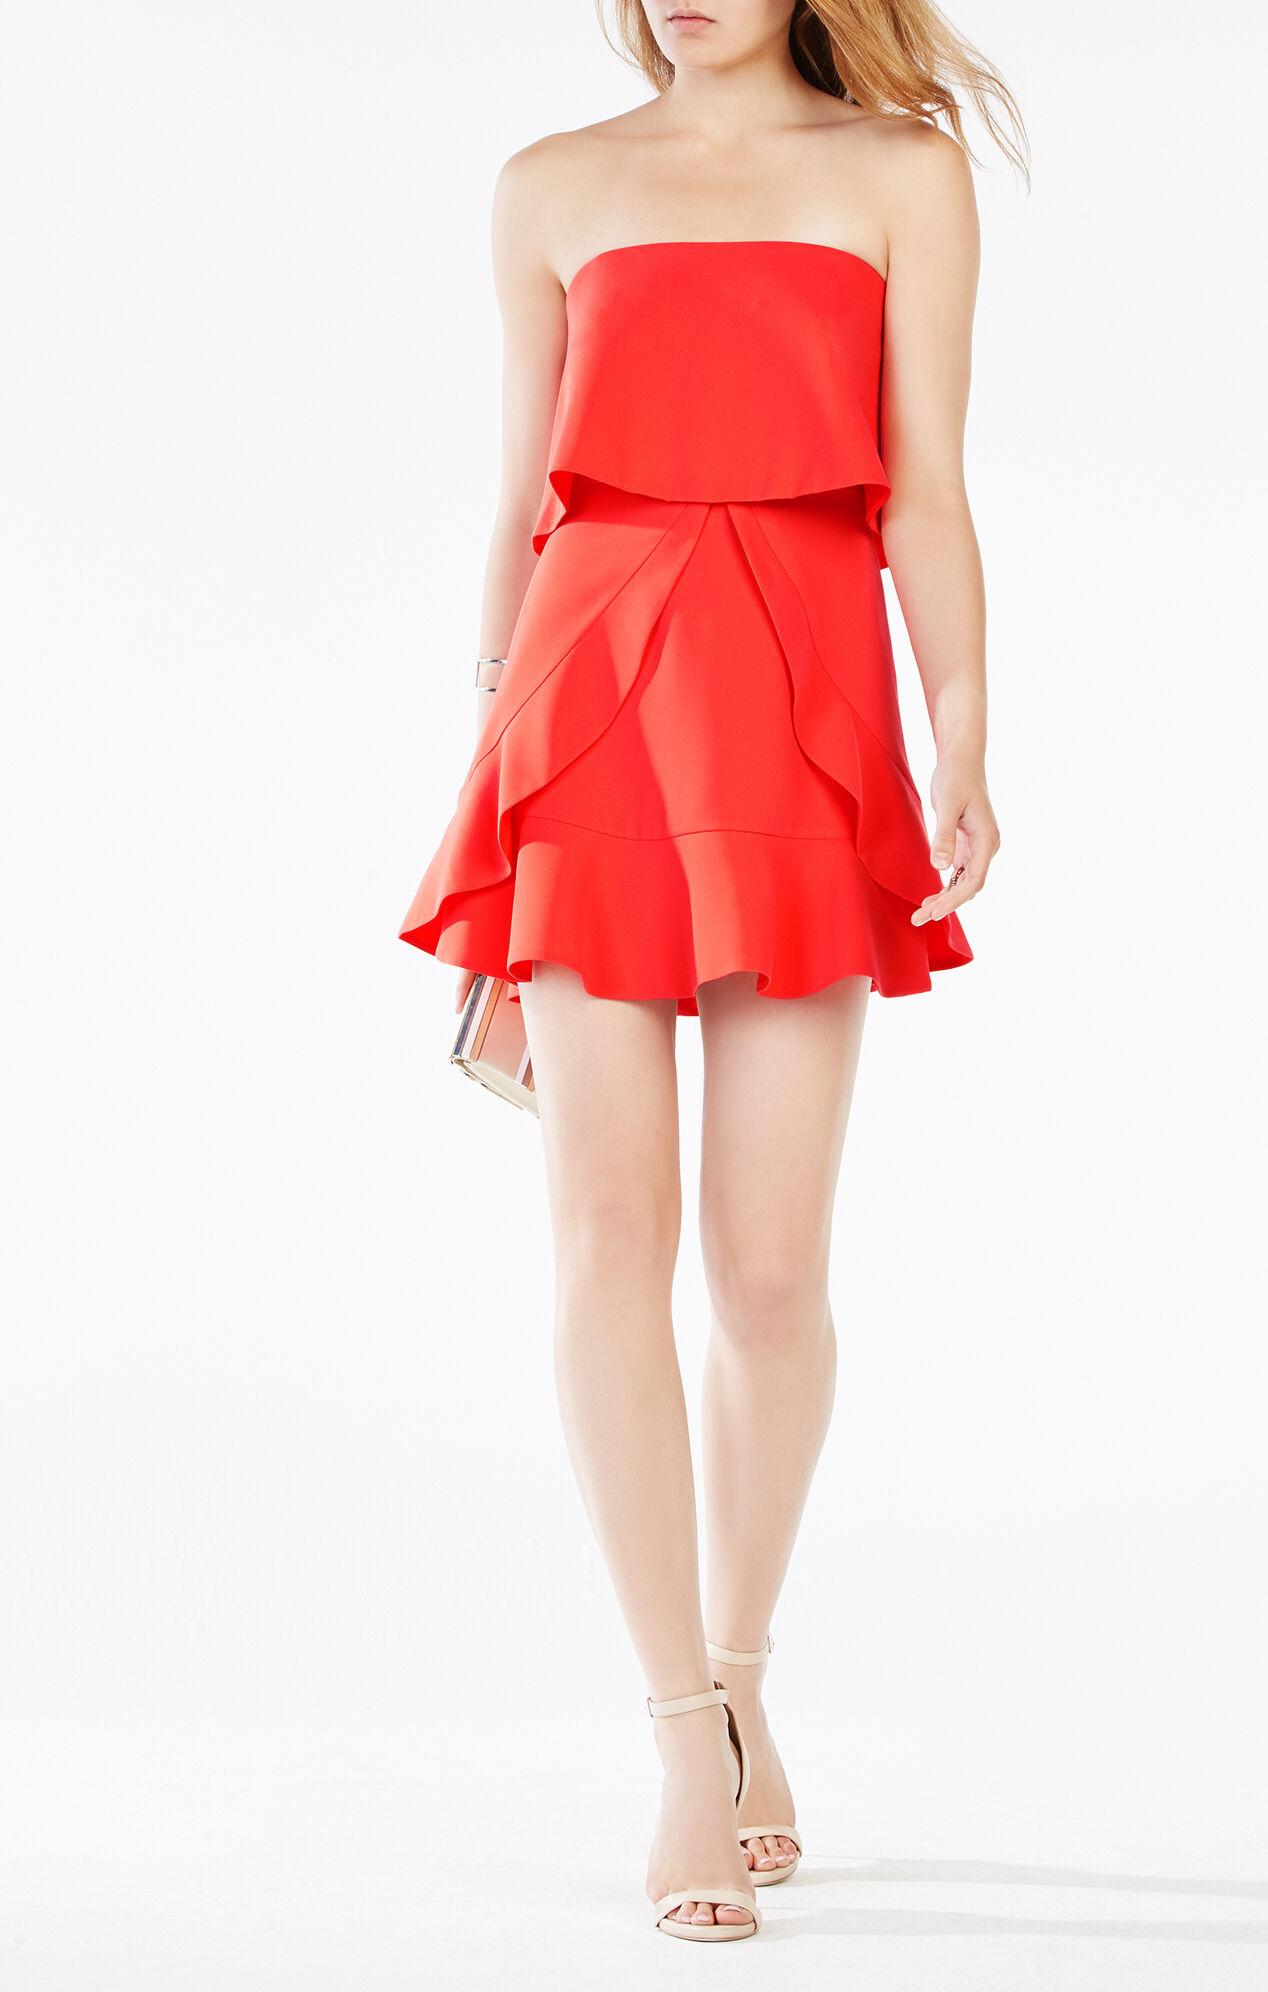 Charlot Strapless Ruffle Dress